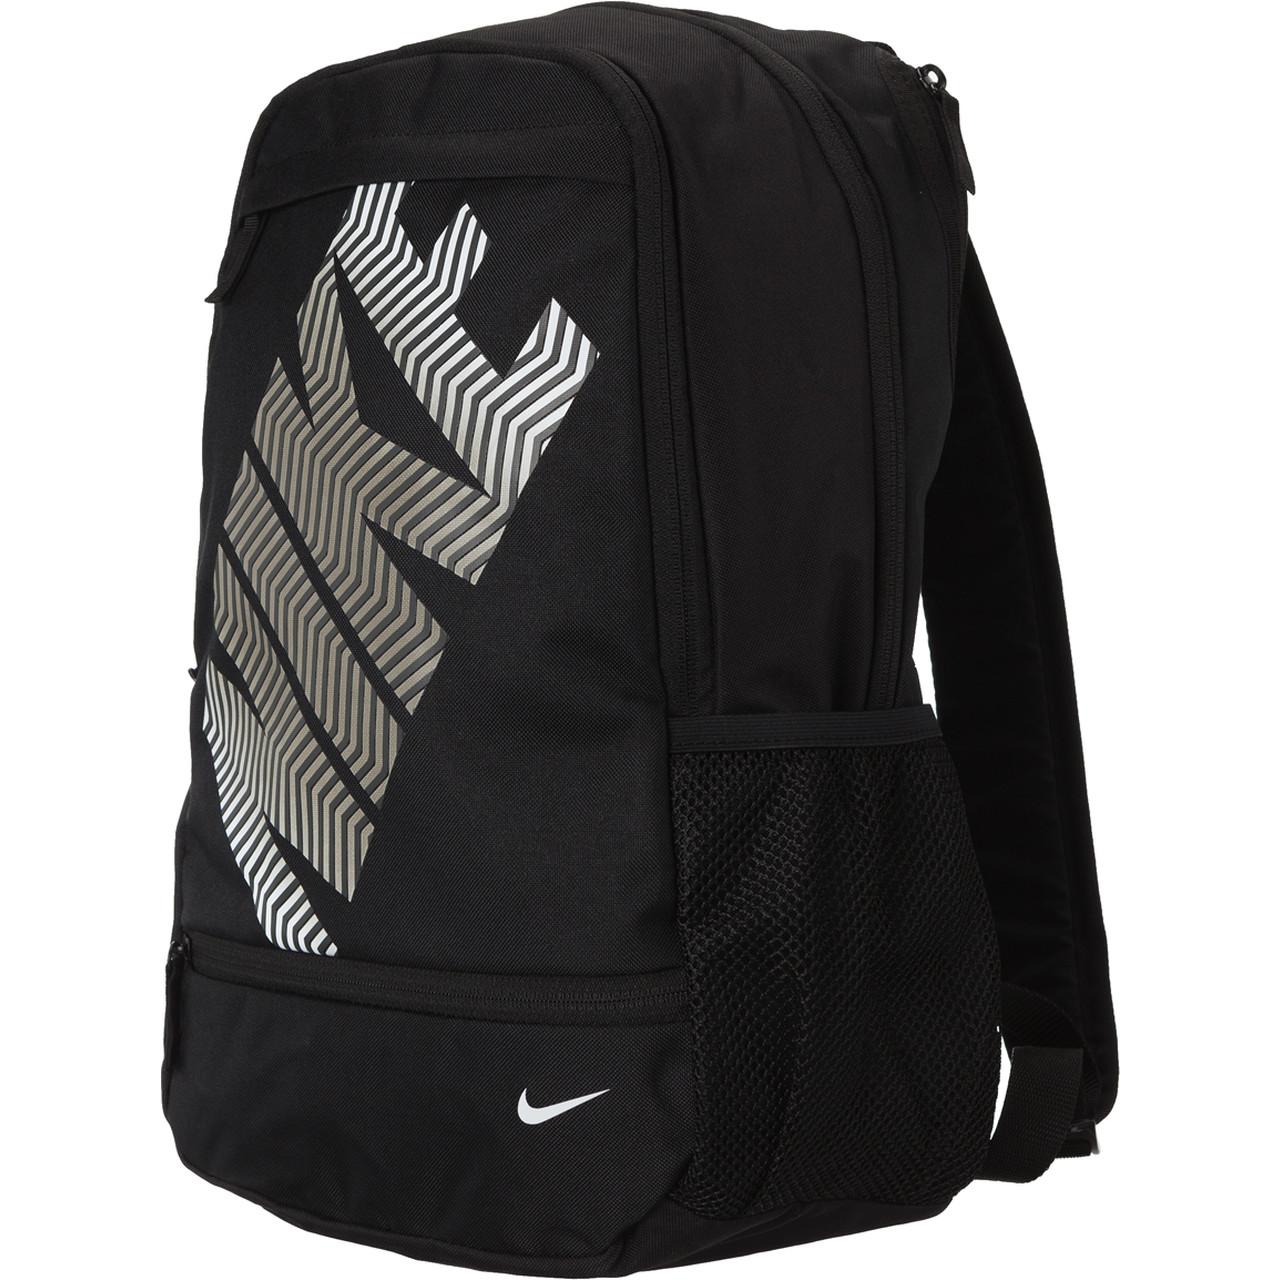 5e0a86ab21f8c Plecak sportowy Nike <br/><small>Classic Line 001 ...